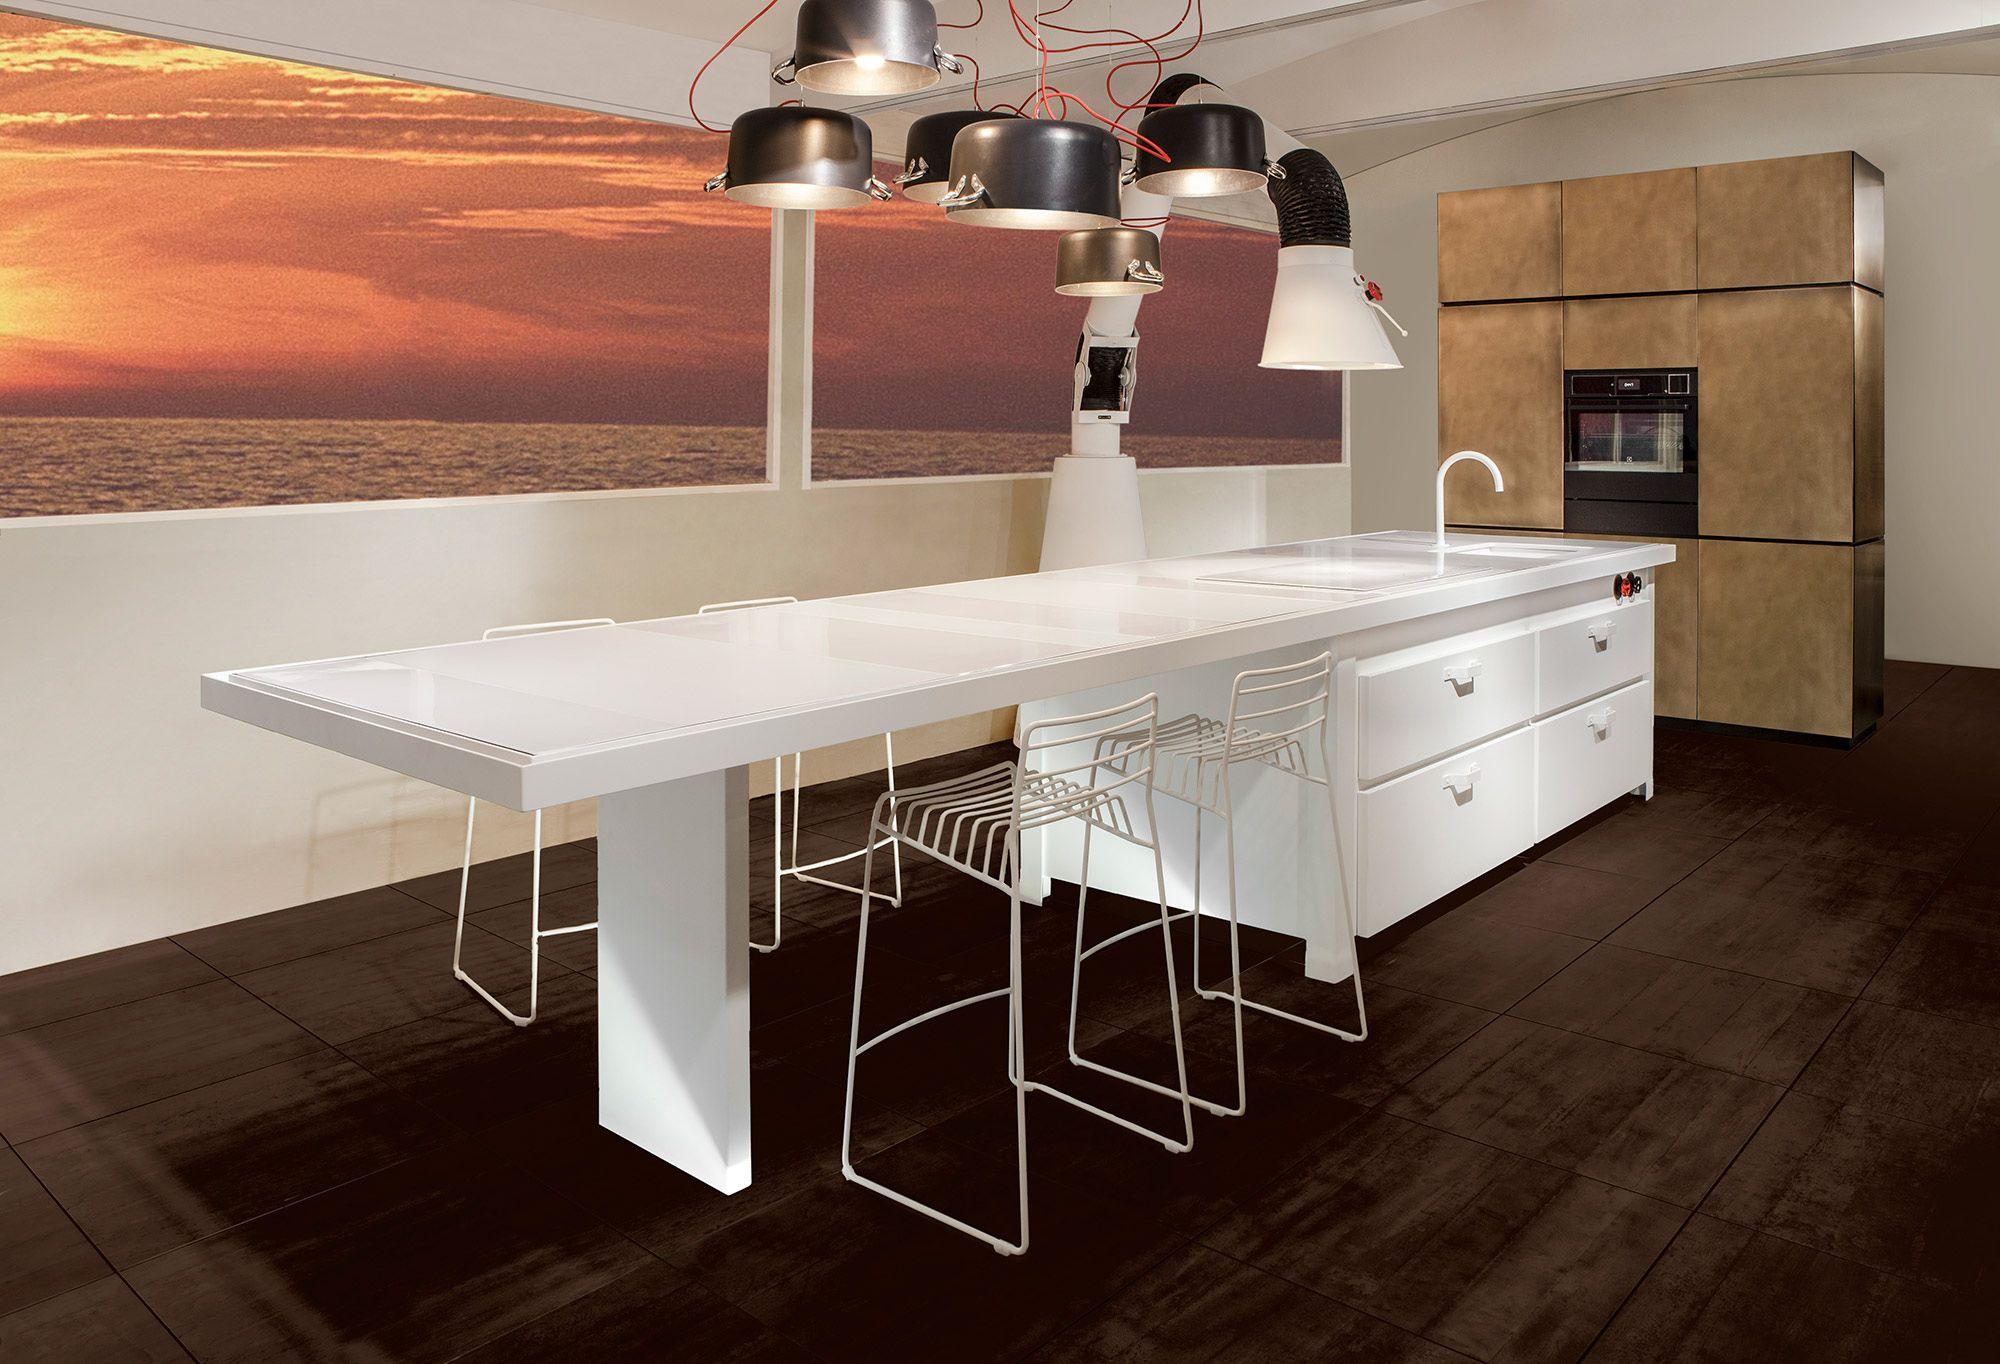 Minacciolo cersaie cersail kitchen design mammut - Minacciolo cuisine ...